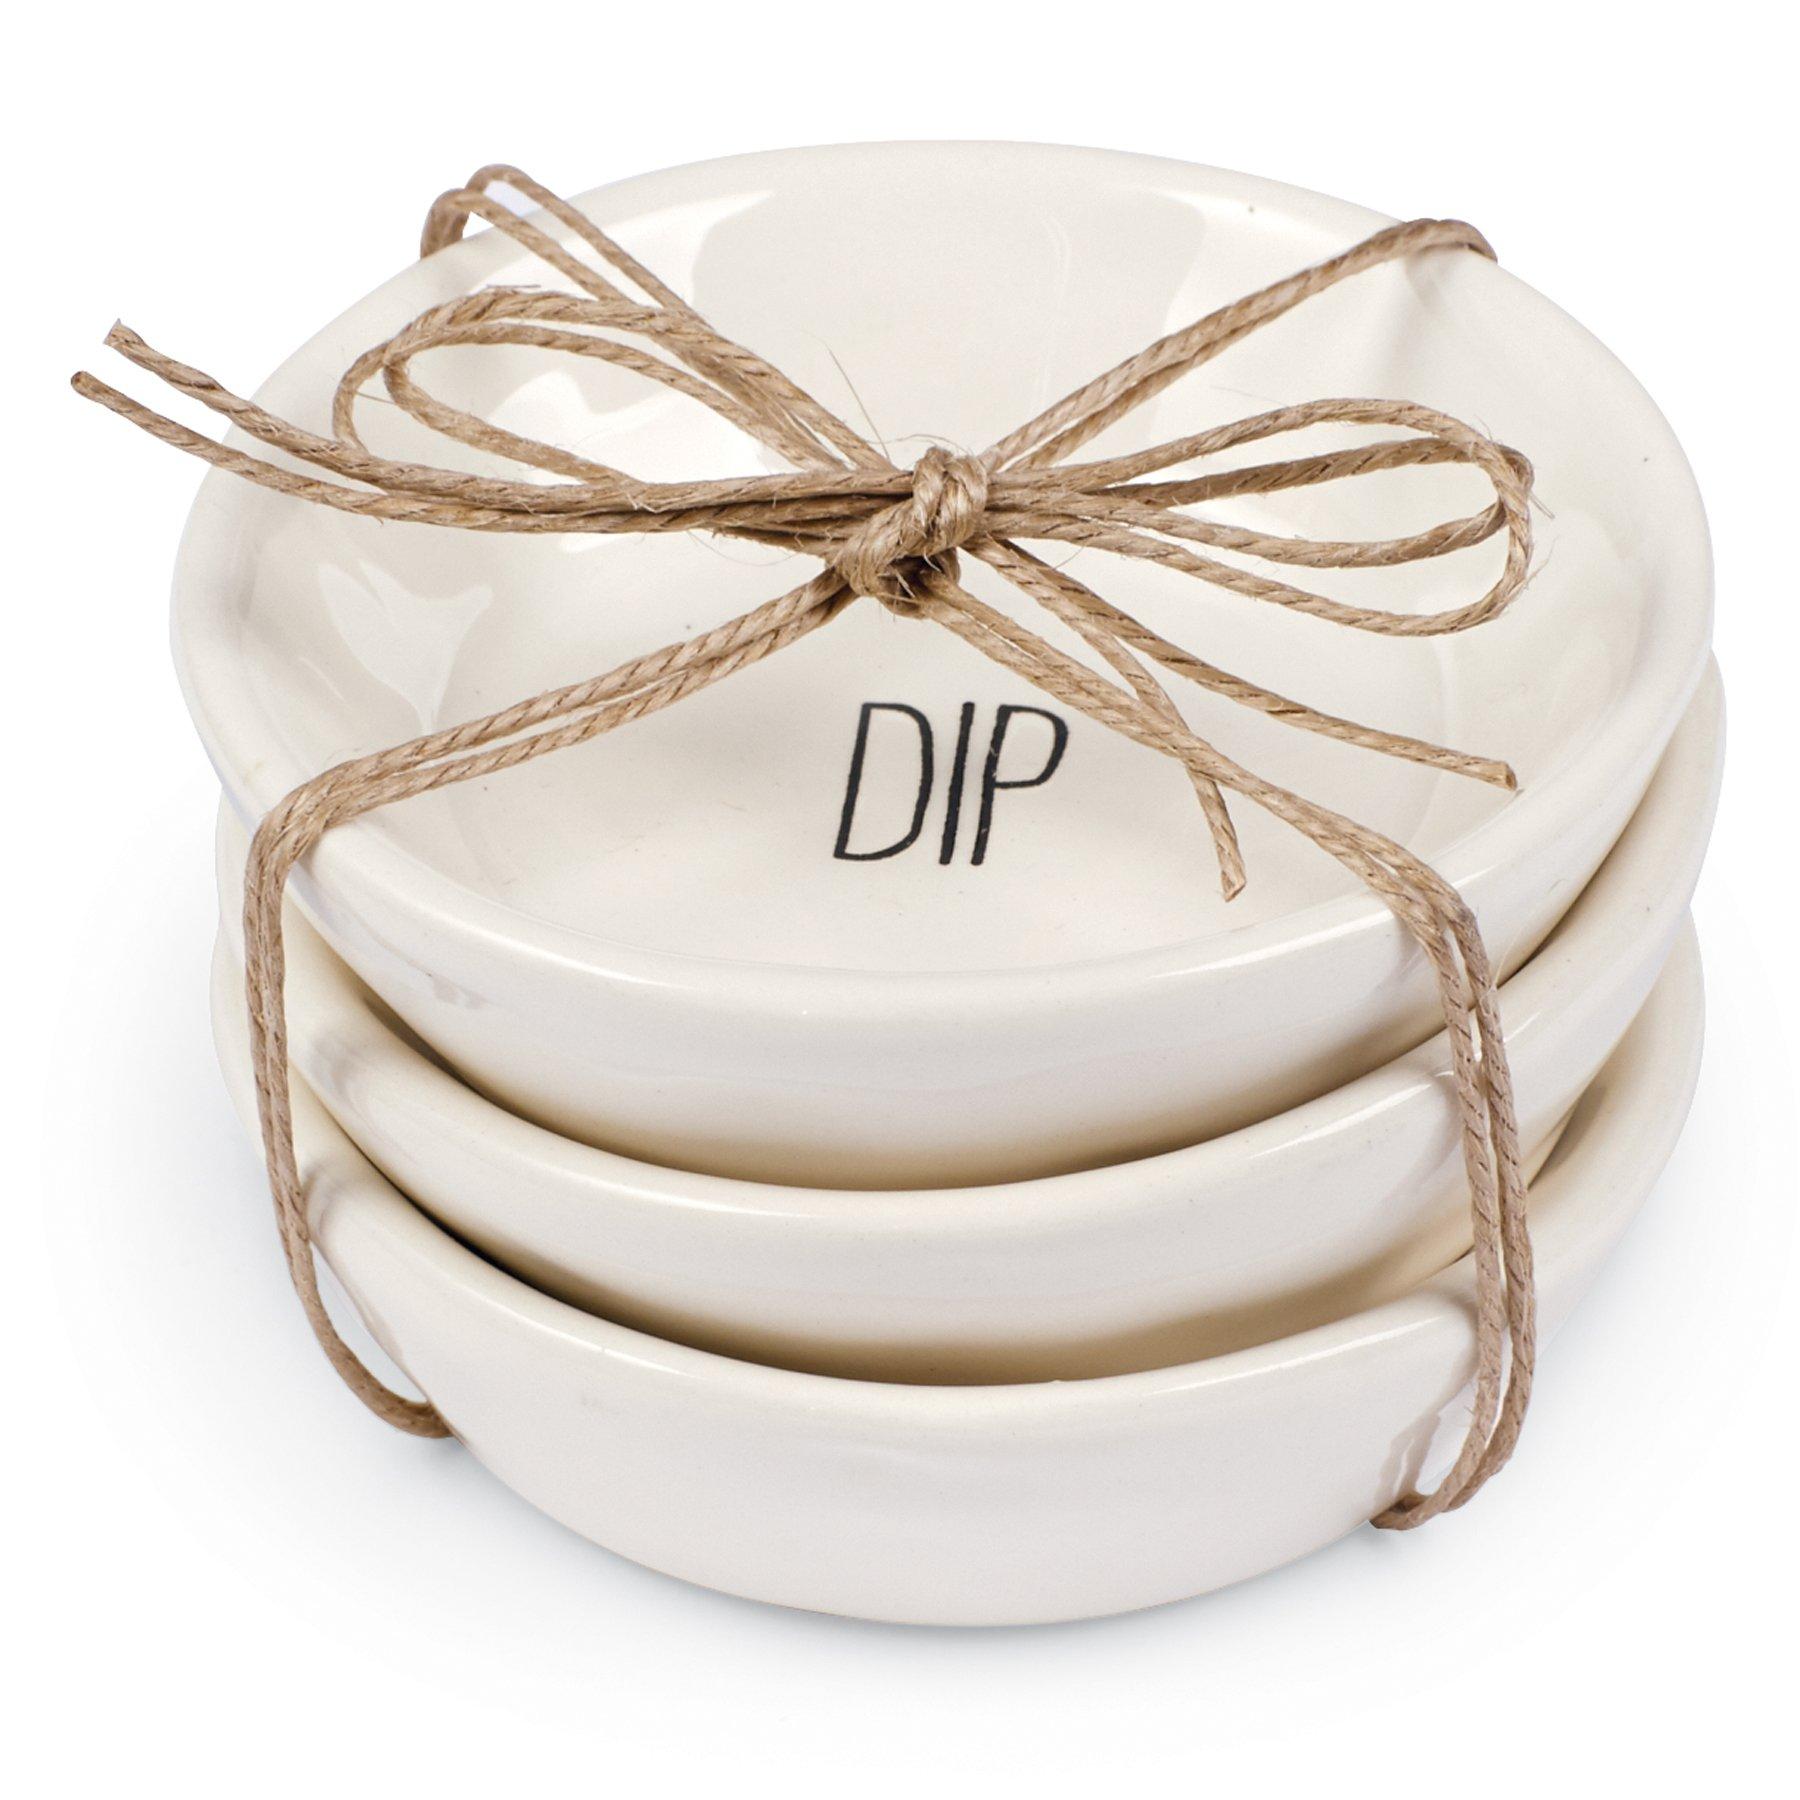 Mud Pie Ceramic Tidbit Condiment Dipping Plates, White by Mud Pie (Image #2)